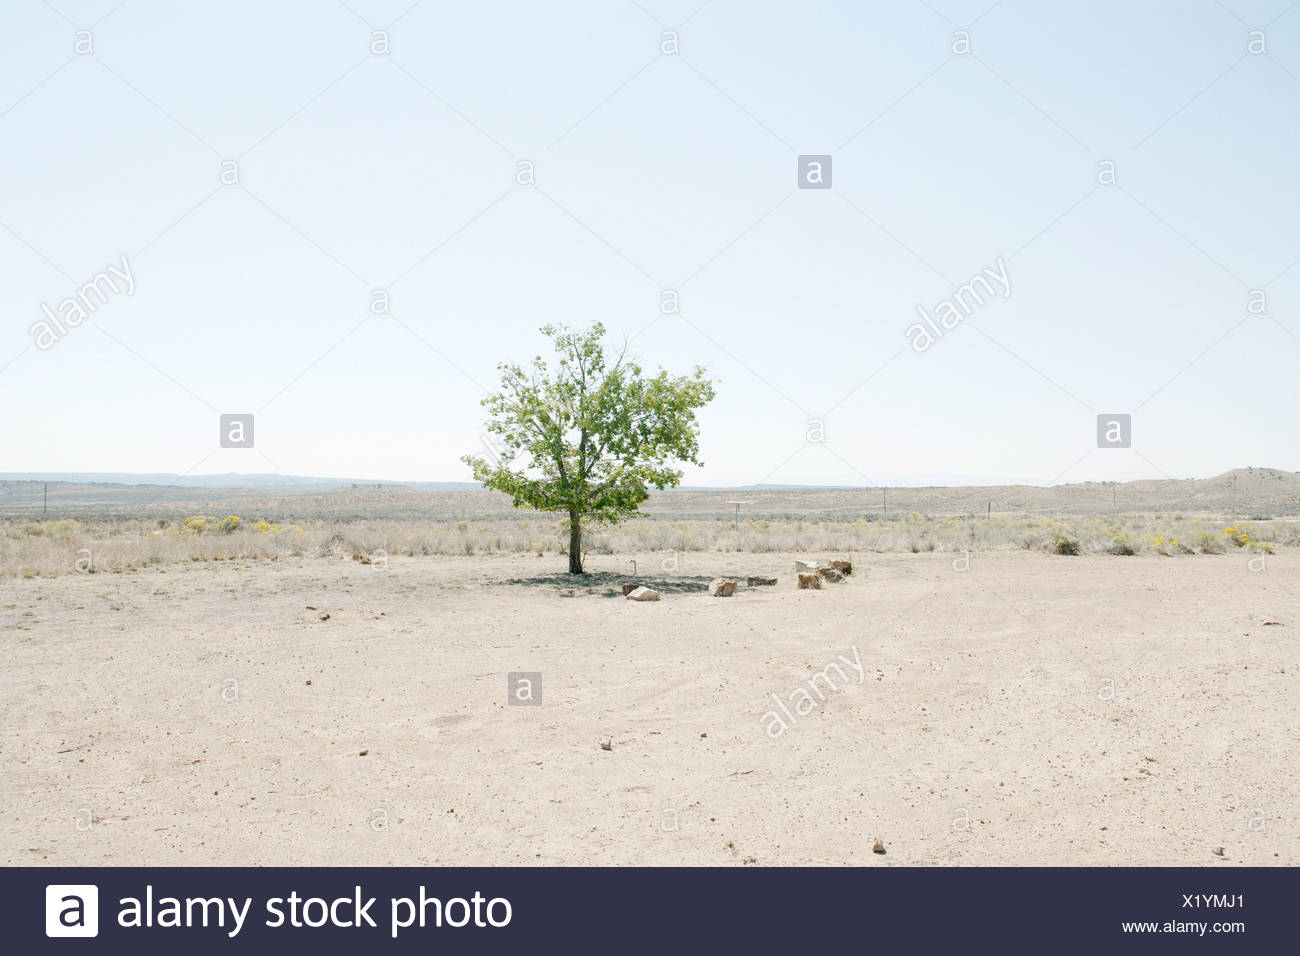 Lone tree in desert landscape - Stock Image